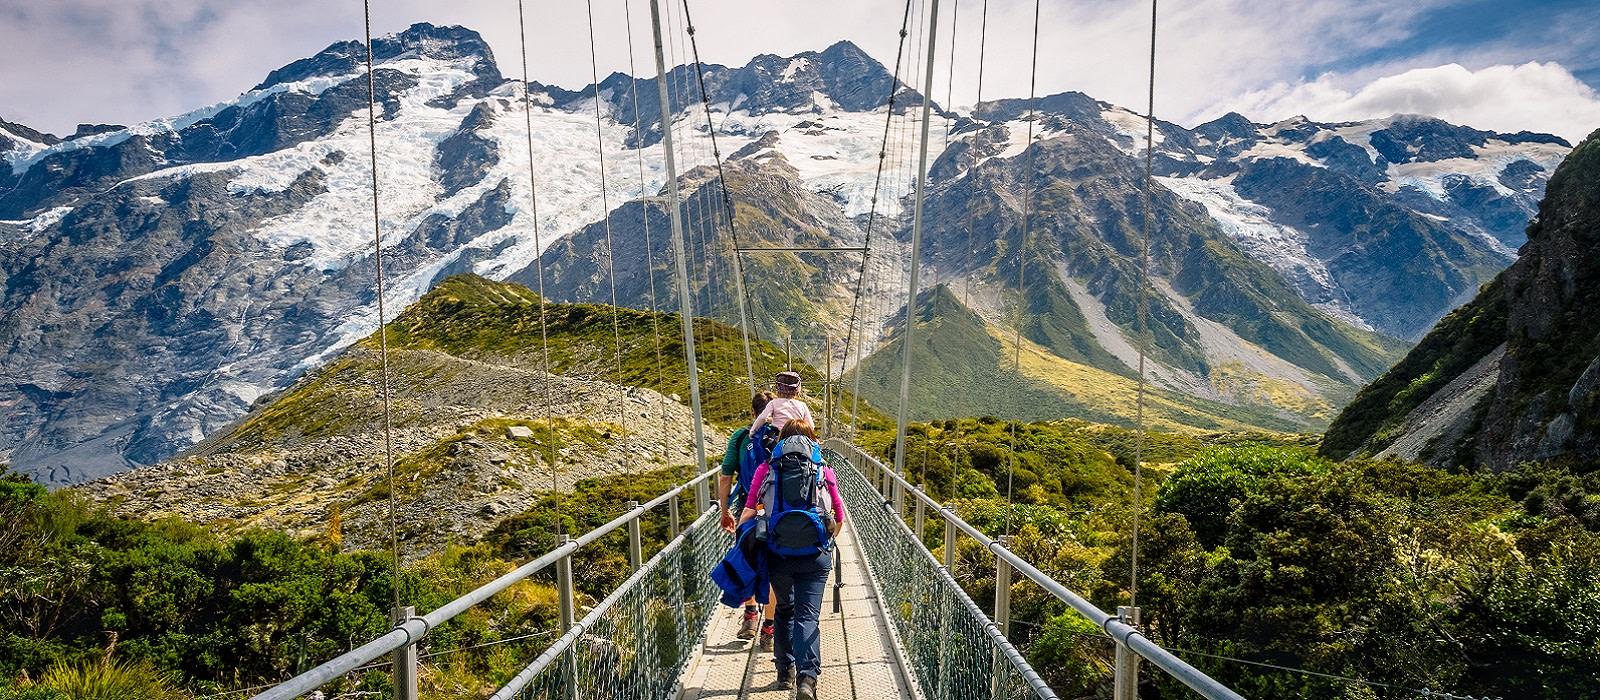 Destination Mt Cook New Zealand